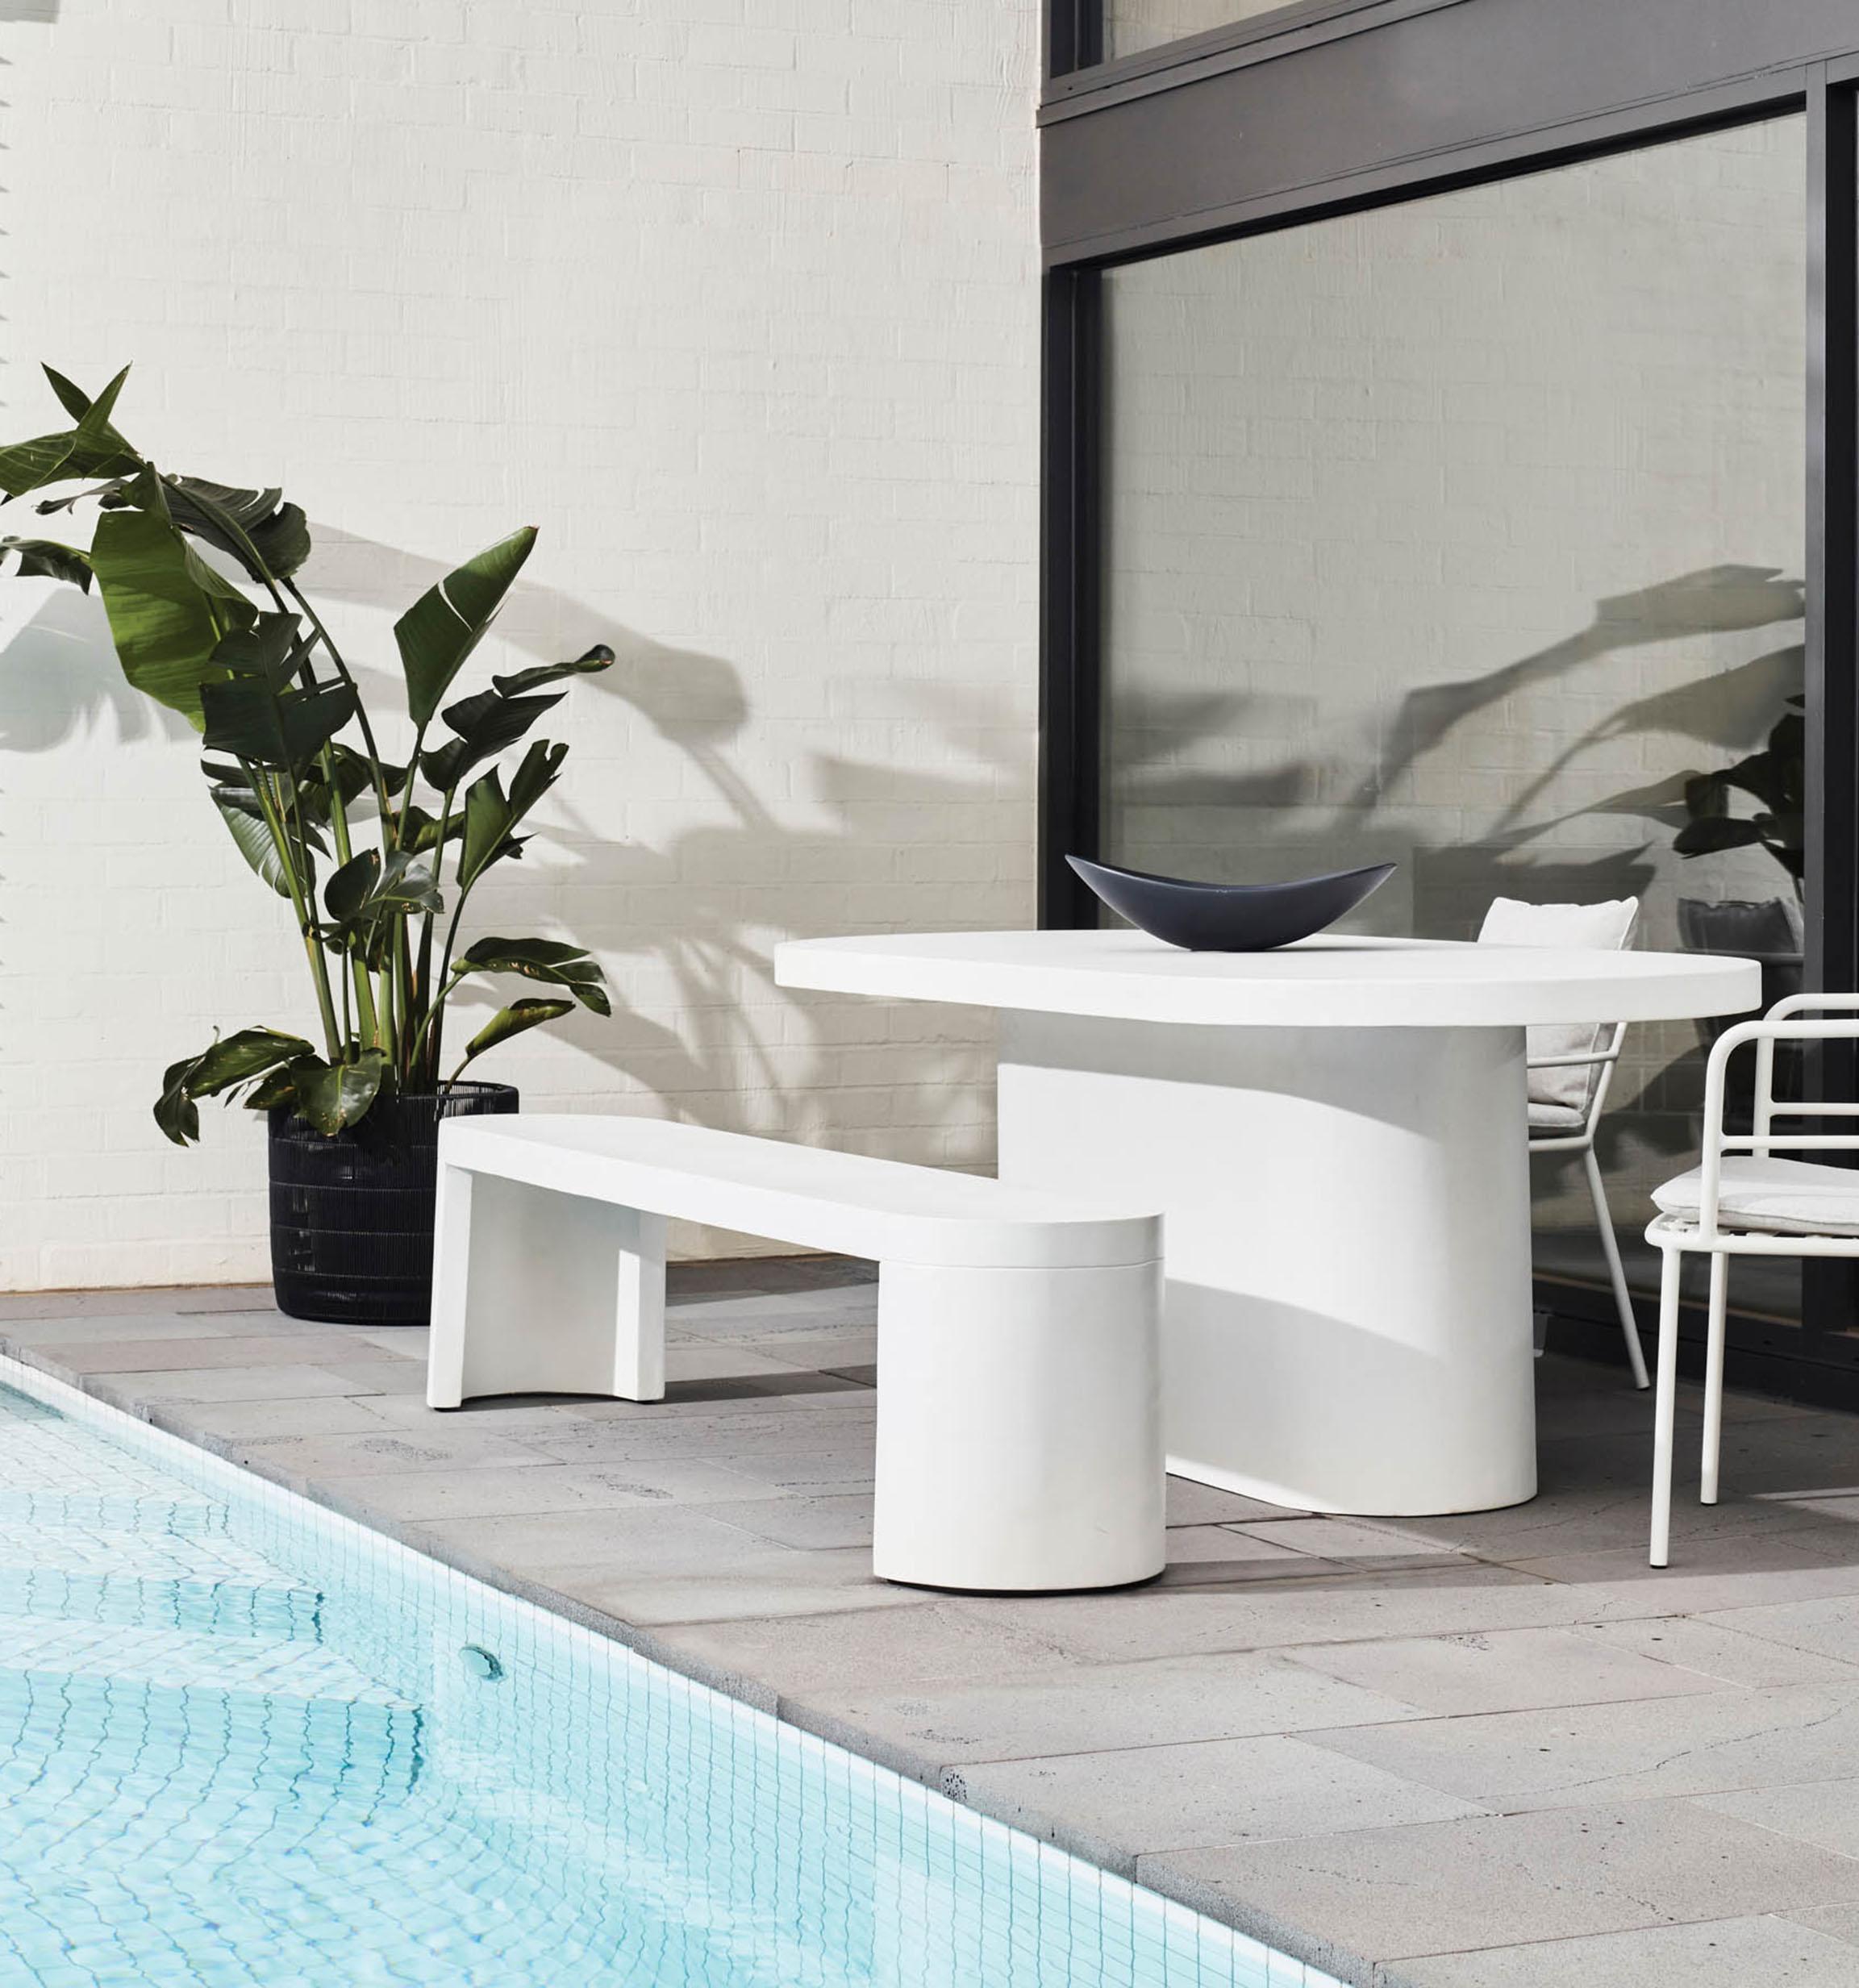 Furniture menu-images dining-tables